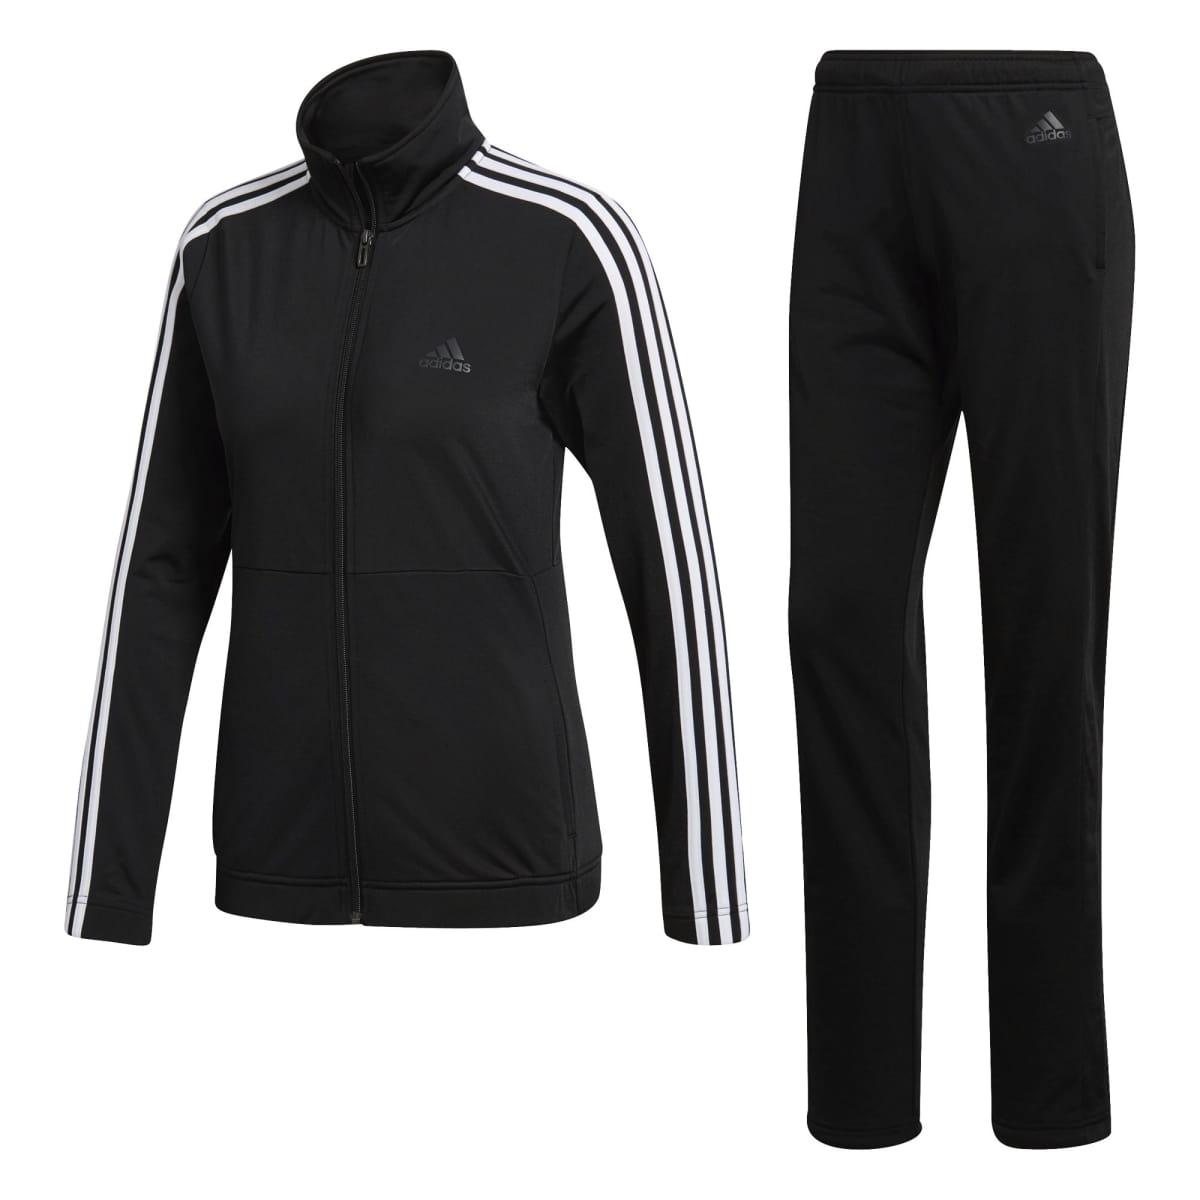 Apparelhttps Sportsmans Warehouse Torch Tunik Women Blue Black Navy Xl Adidas Womens Back To Basics Tracksuit